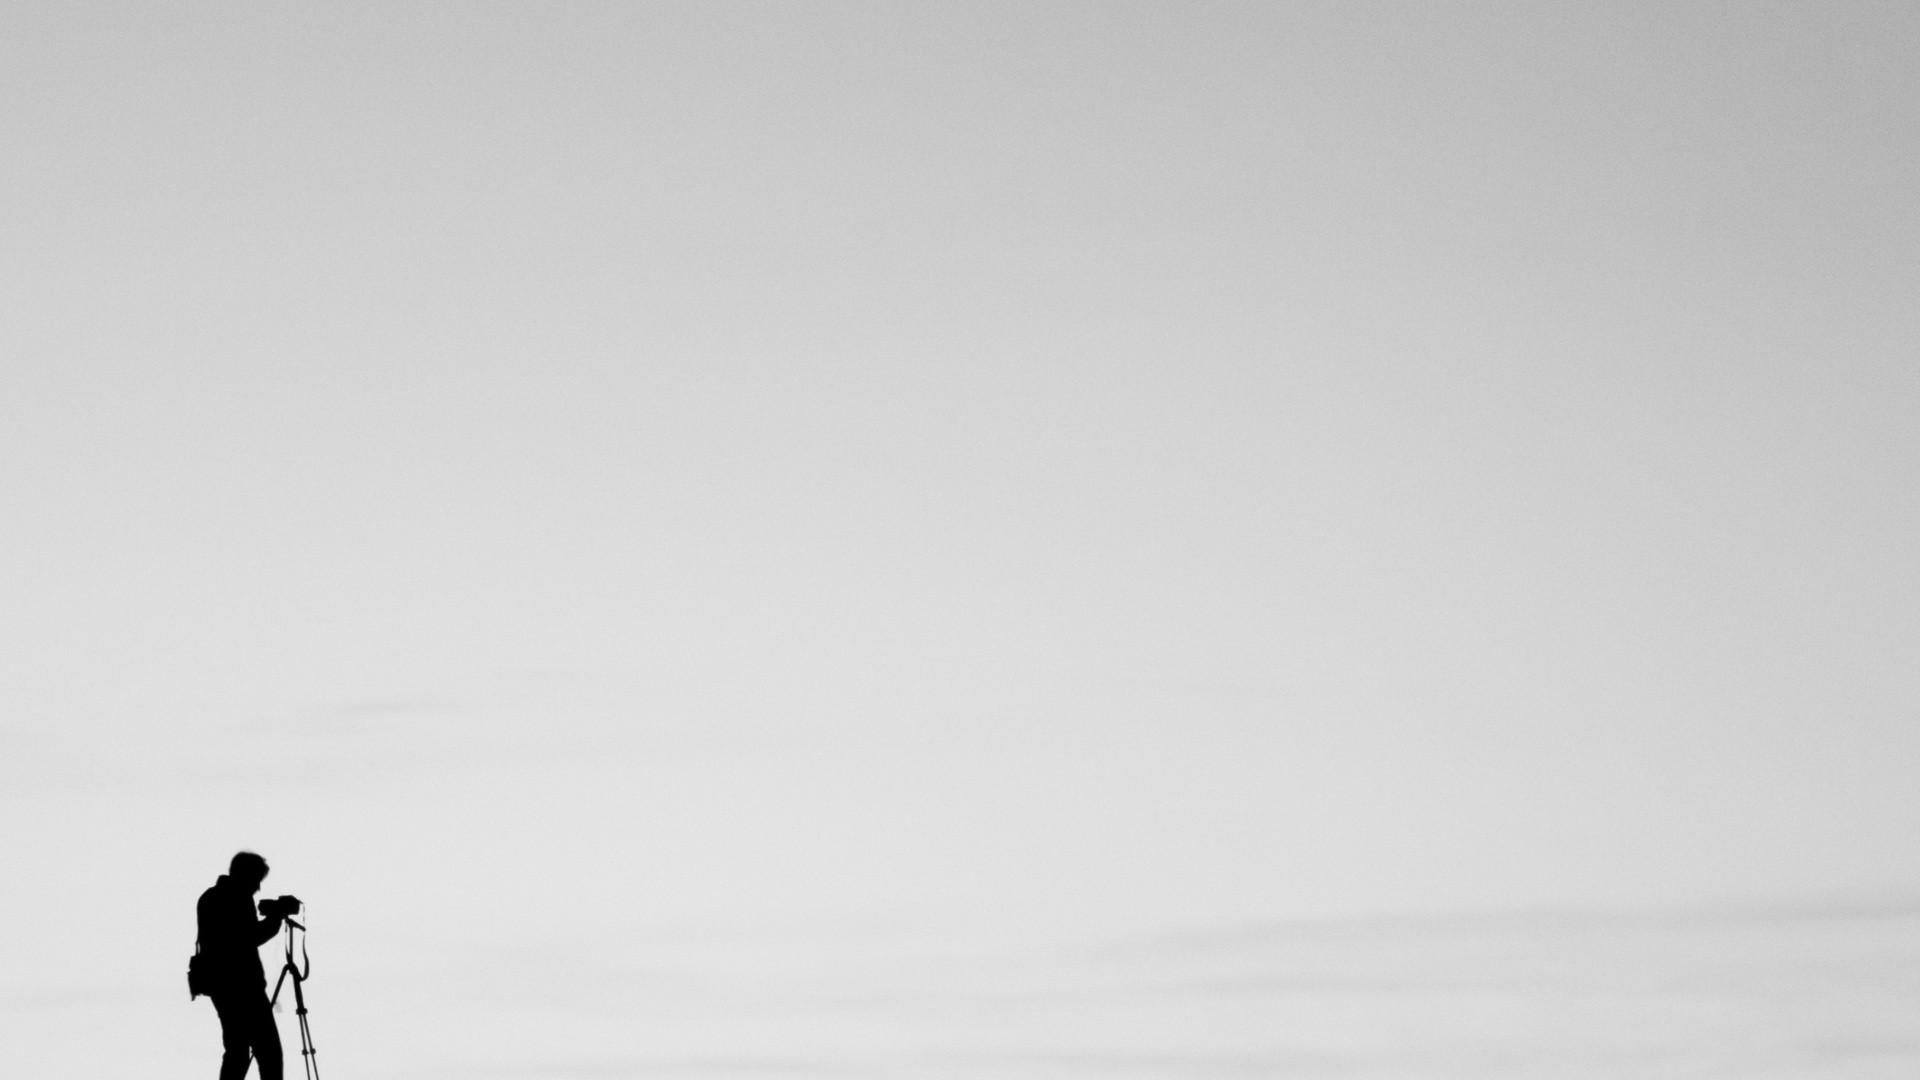 White Minimalist desktop wallpaper hd